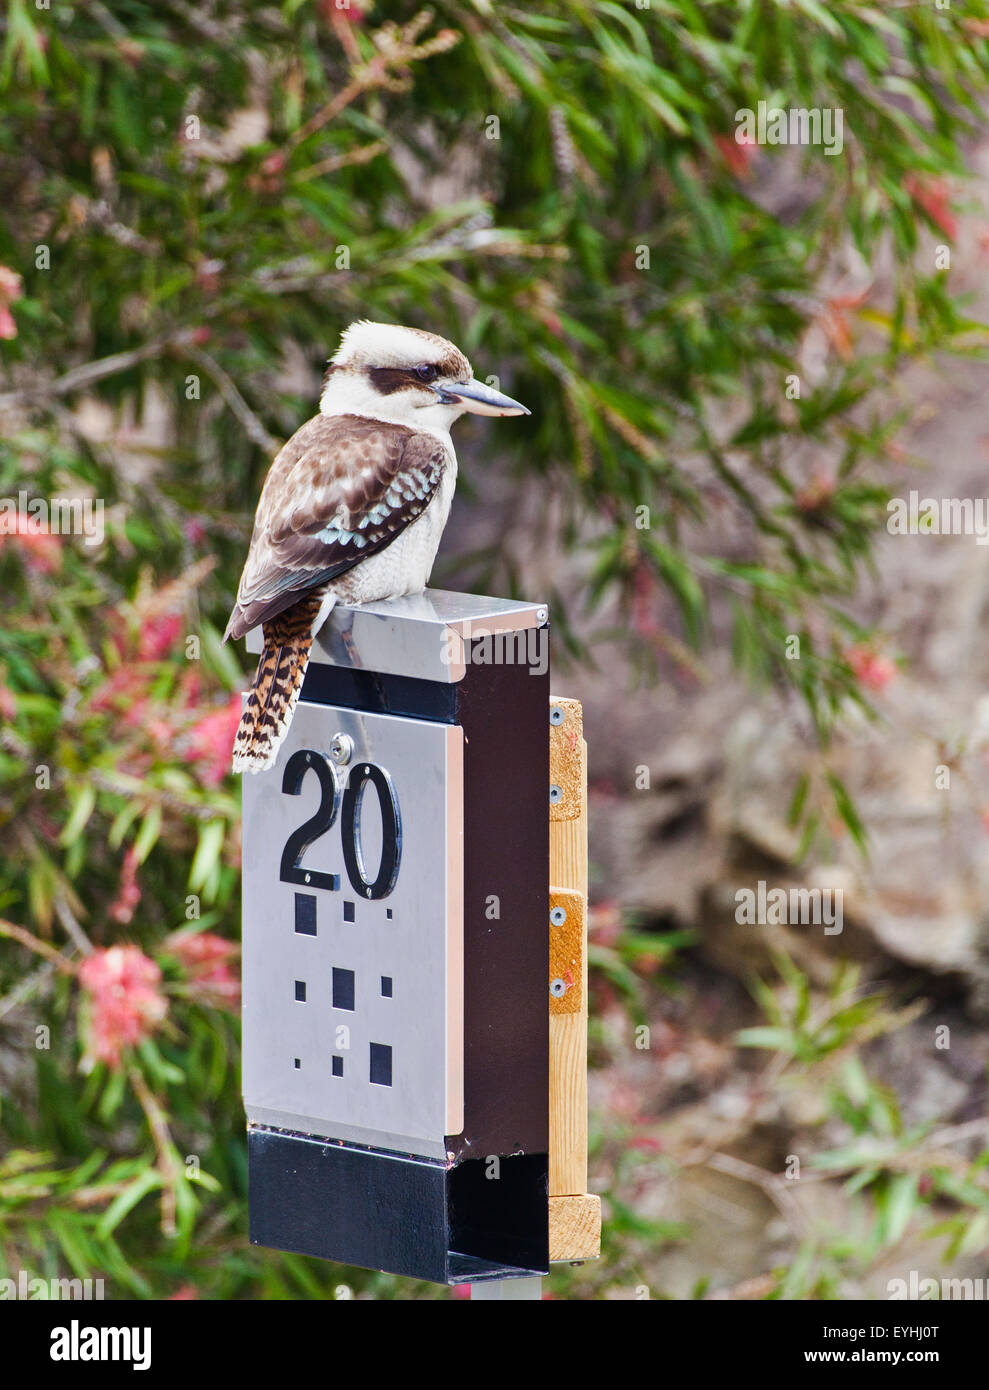 Australia, Kookaburra on a letter box perch - Stock Image